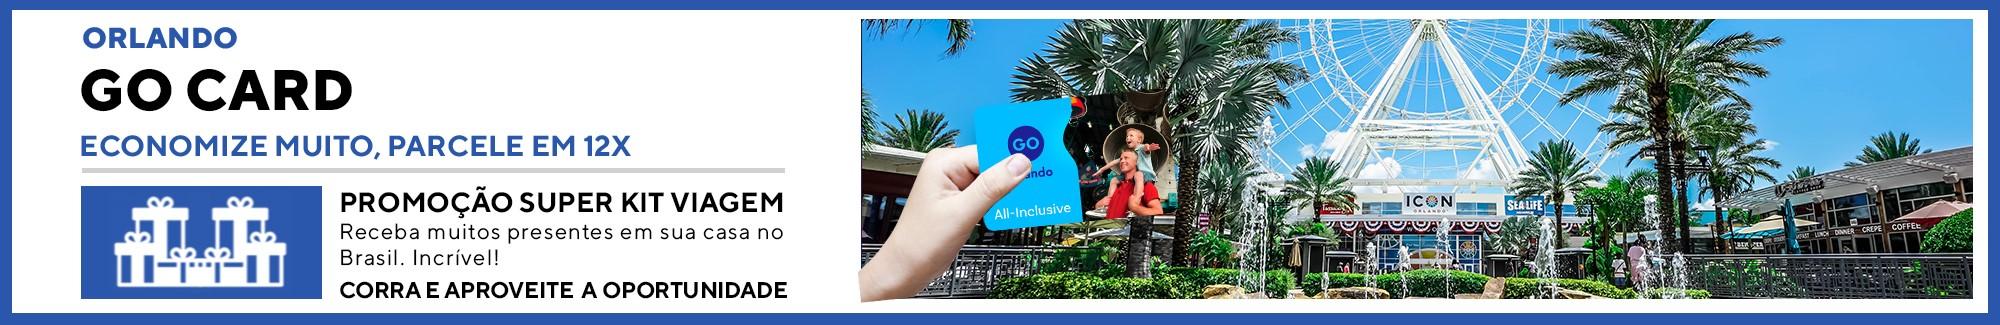 Go Card Orlando